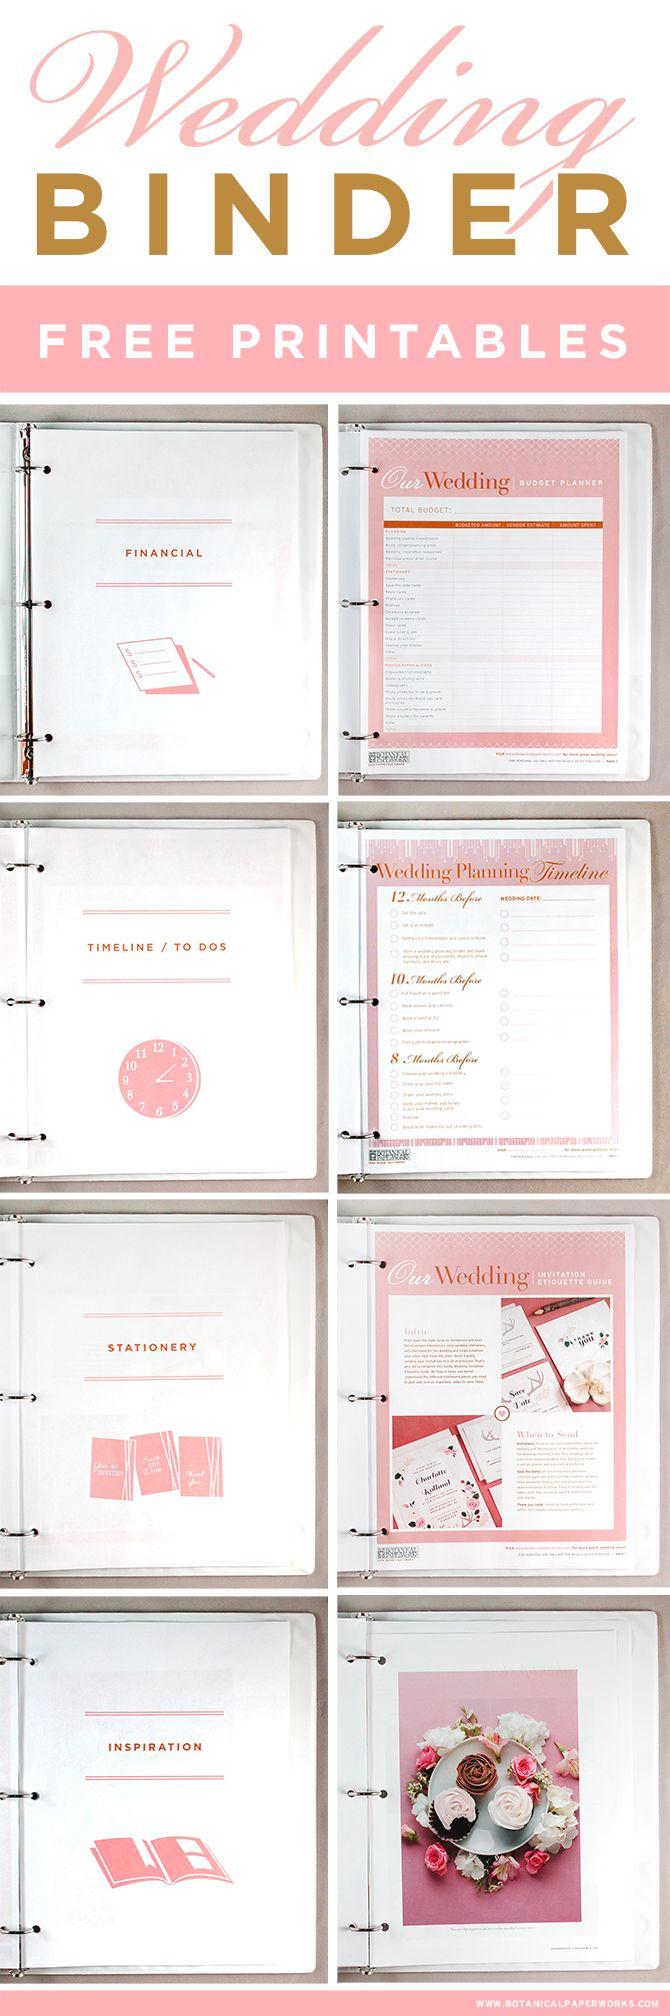 Wedding Planner Guide Free Printable – Wedding Planner Template - Free Printable Wedding Planner Forms